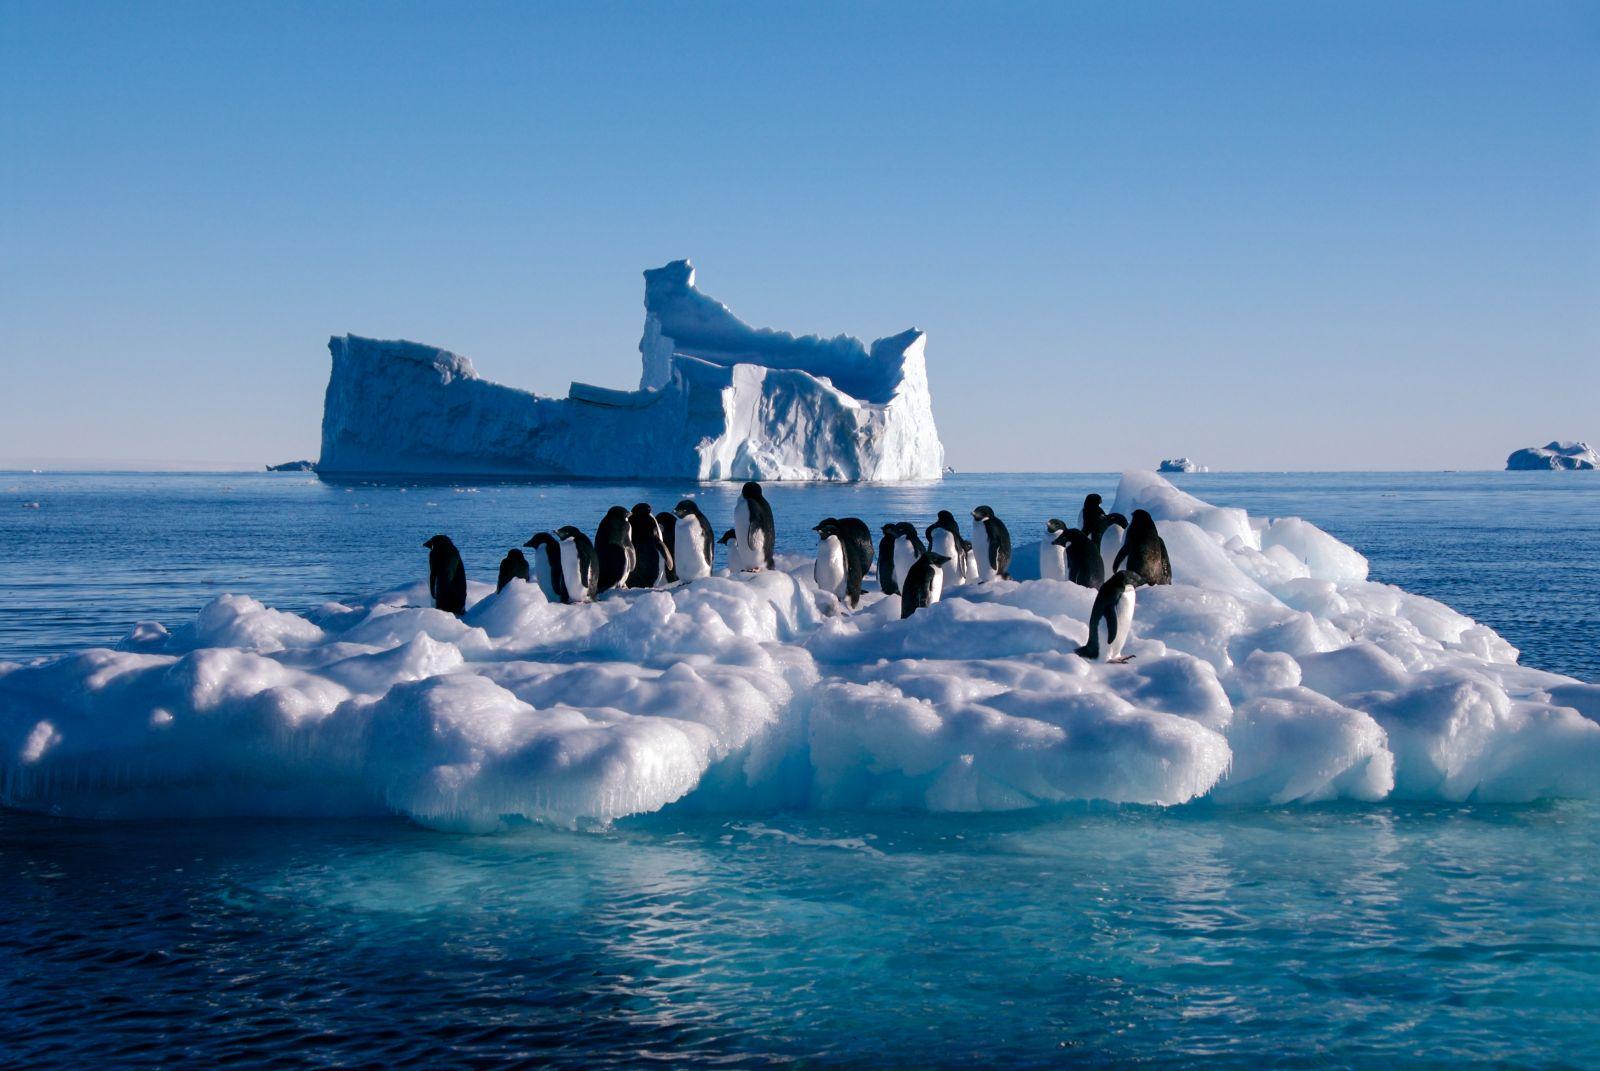 Óriási jéghegy